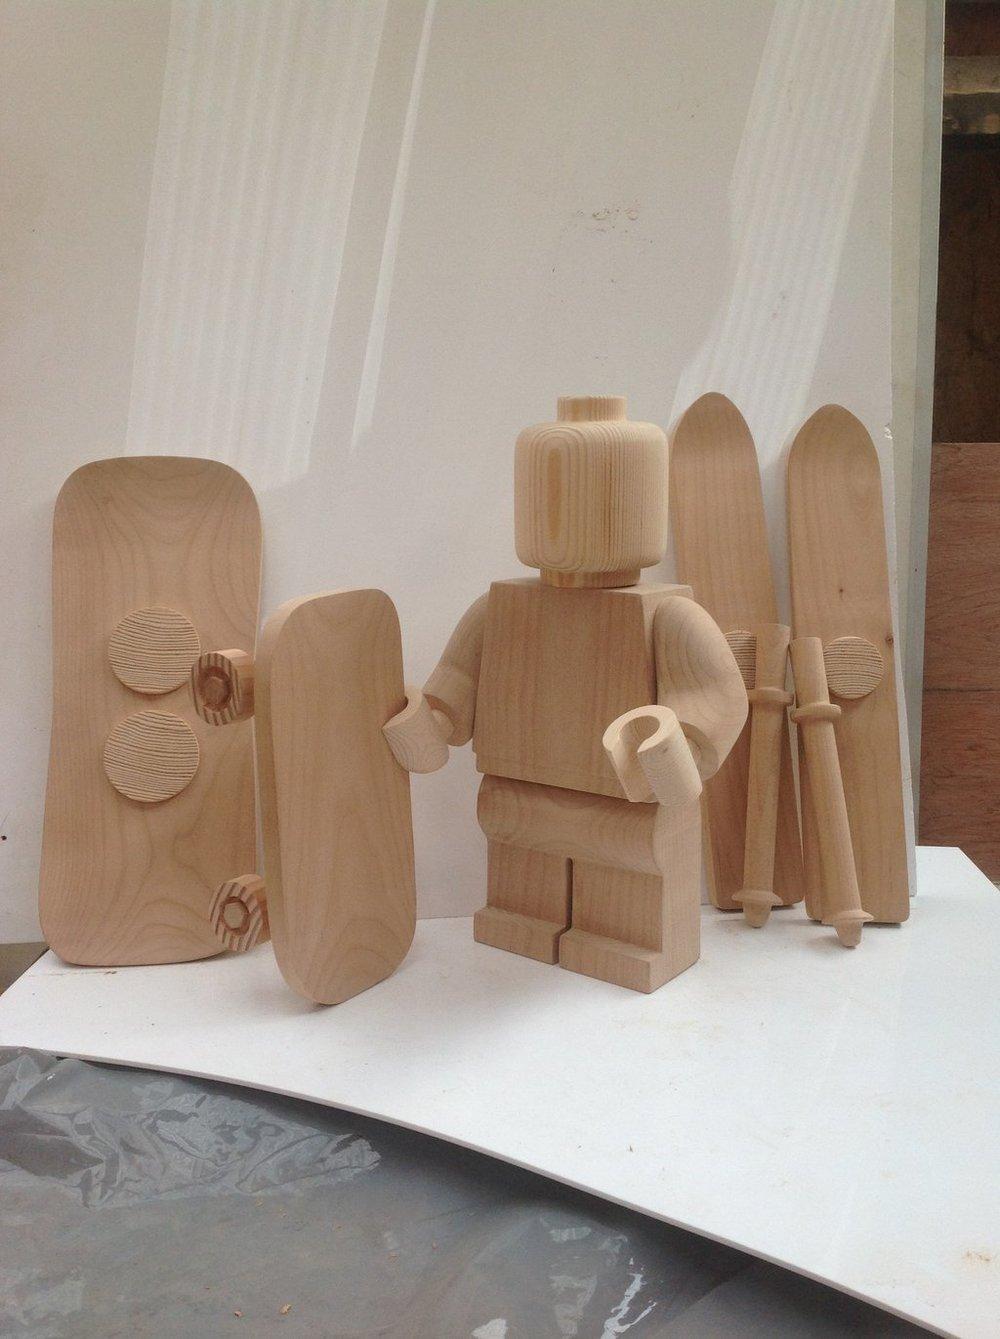 wooden_lego_skate__board_and_ski_by_ragskin-d5znkum.jpg